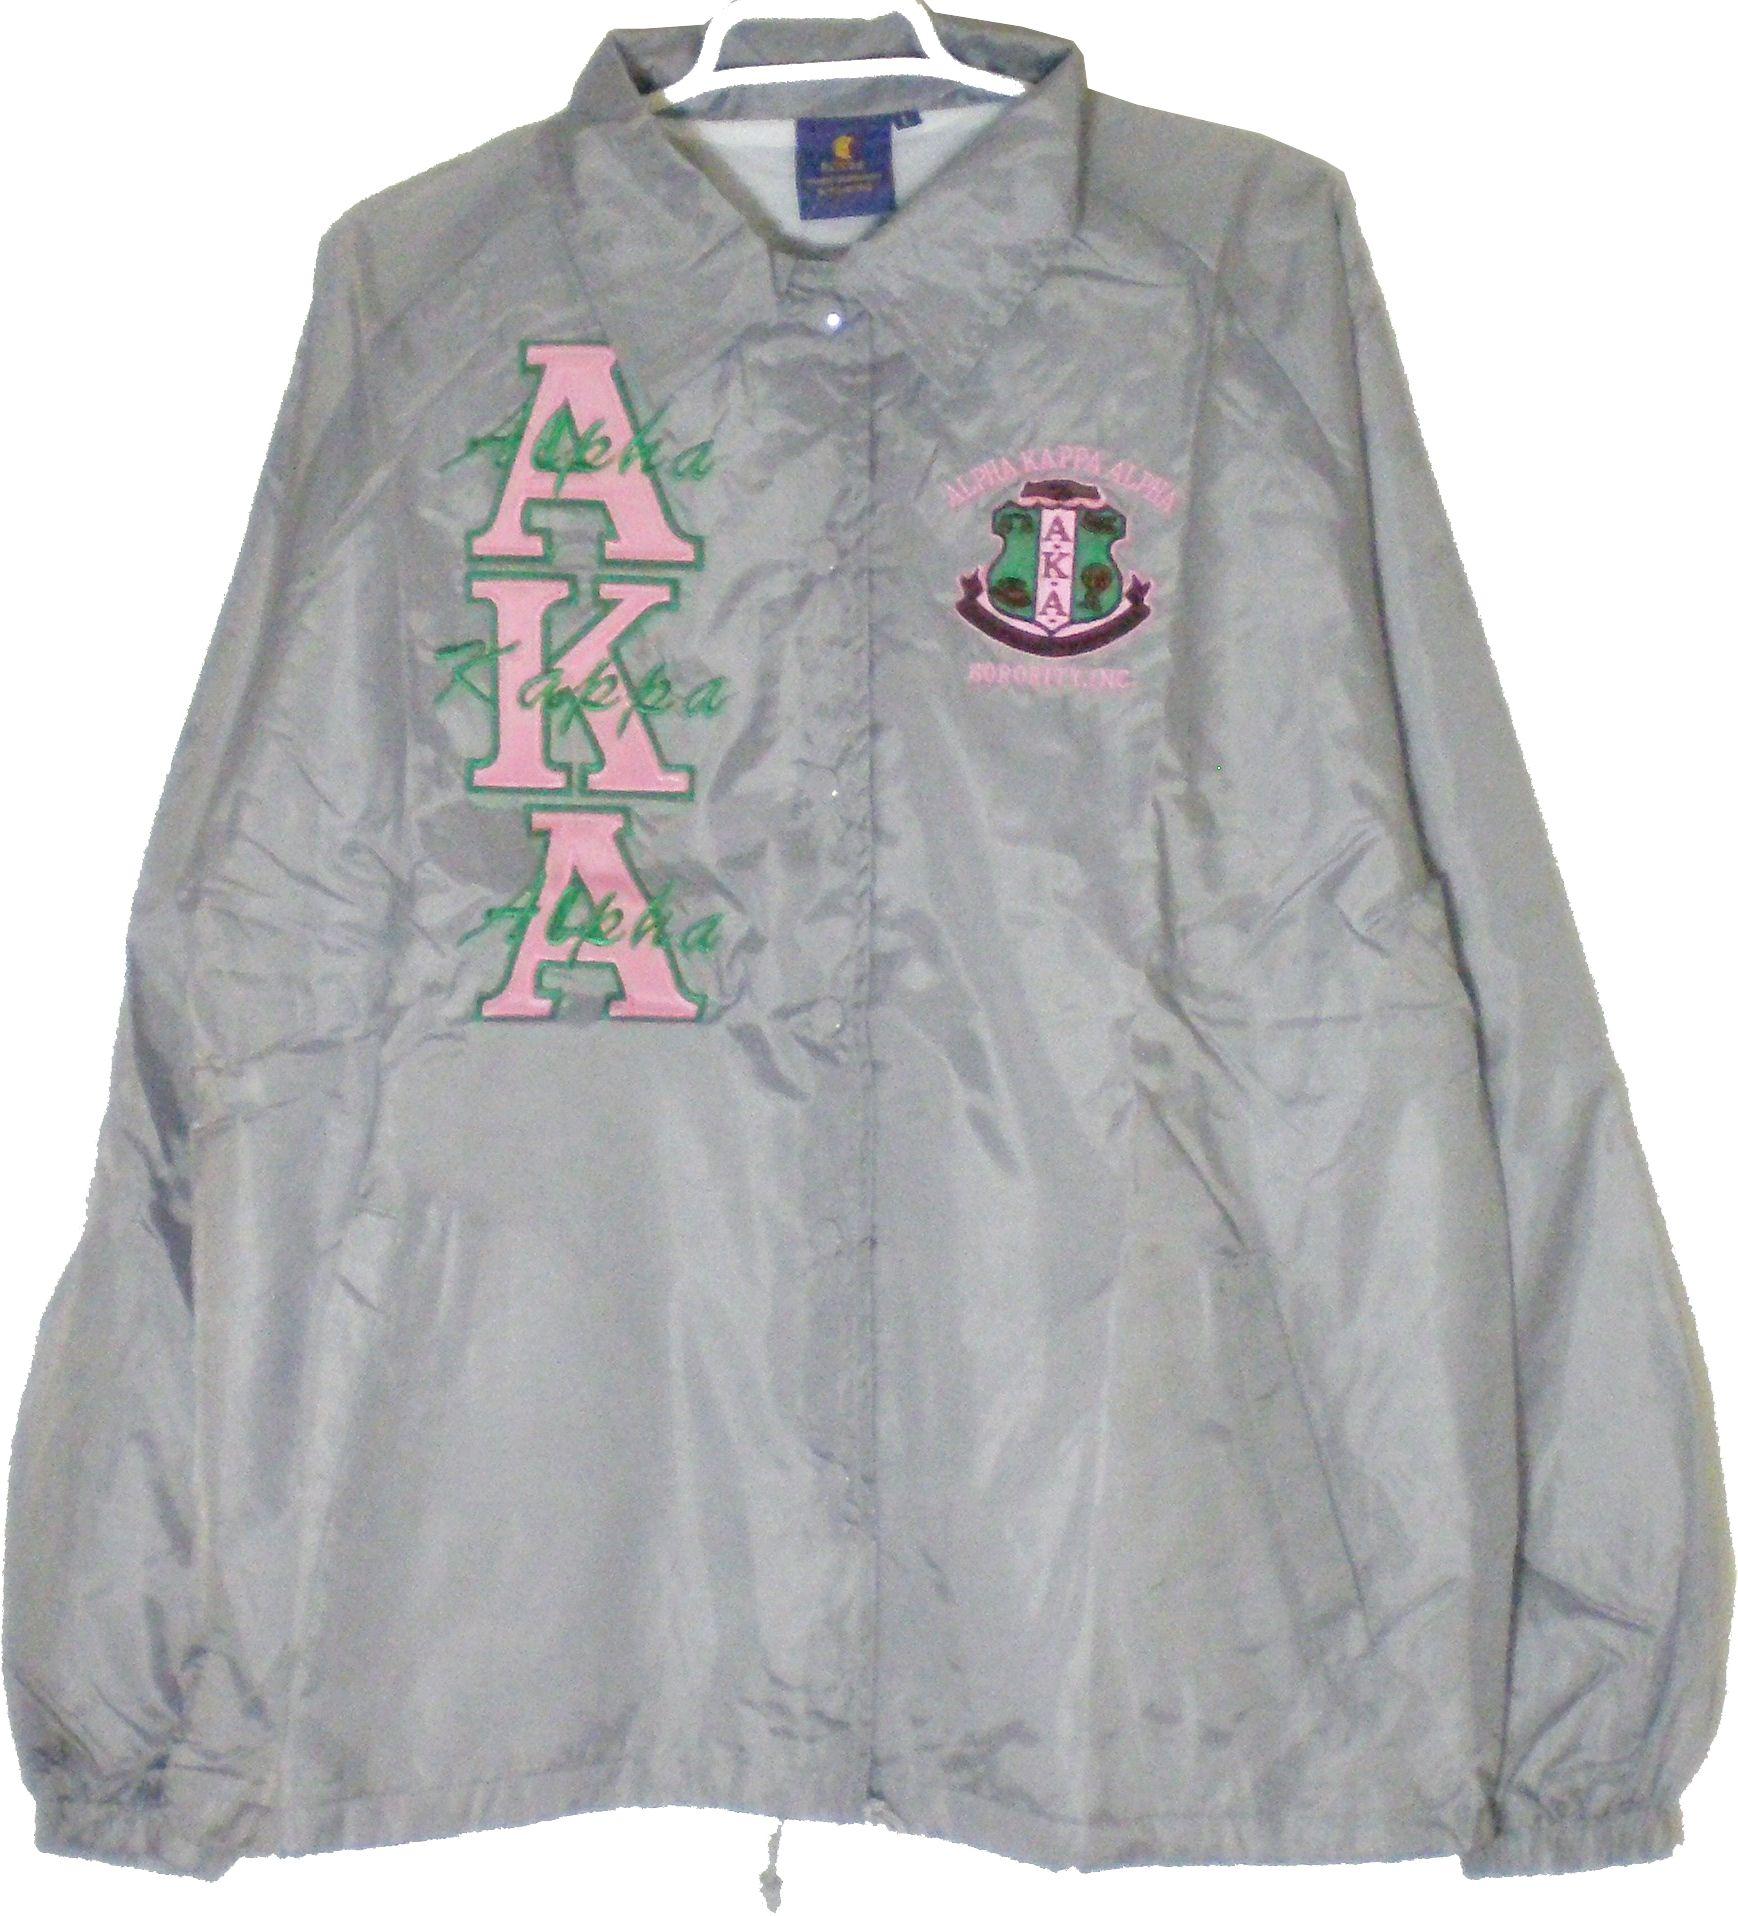 c7a137a2a Buffalo Dallas Alpha Kappa Alpha Ladies Crossing Line Jacket [Silver ...